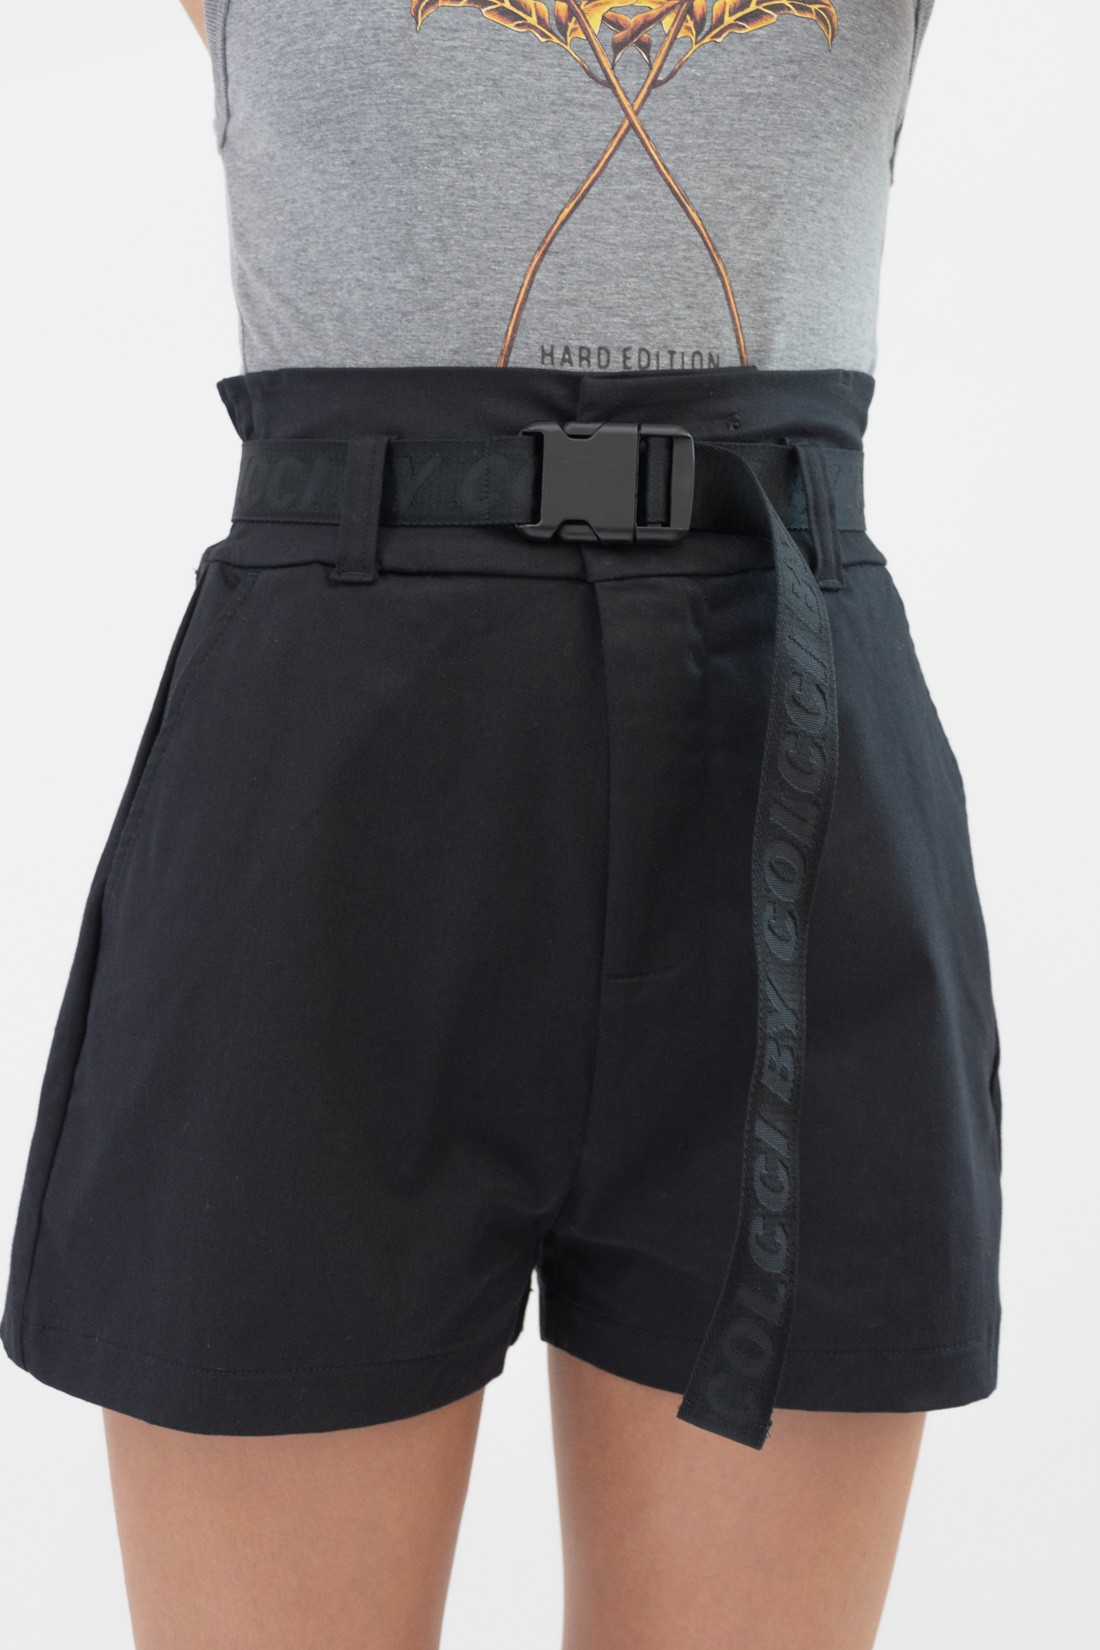 Shorts Colcci Clochard